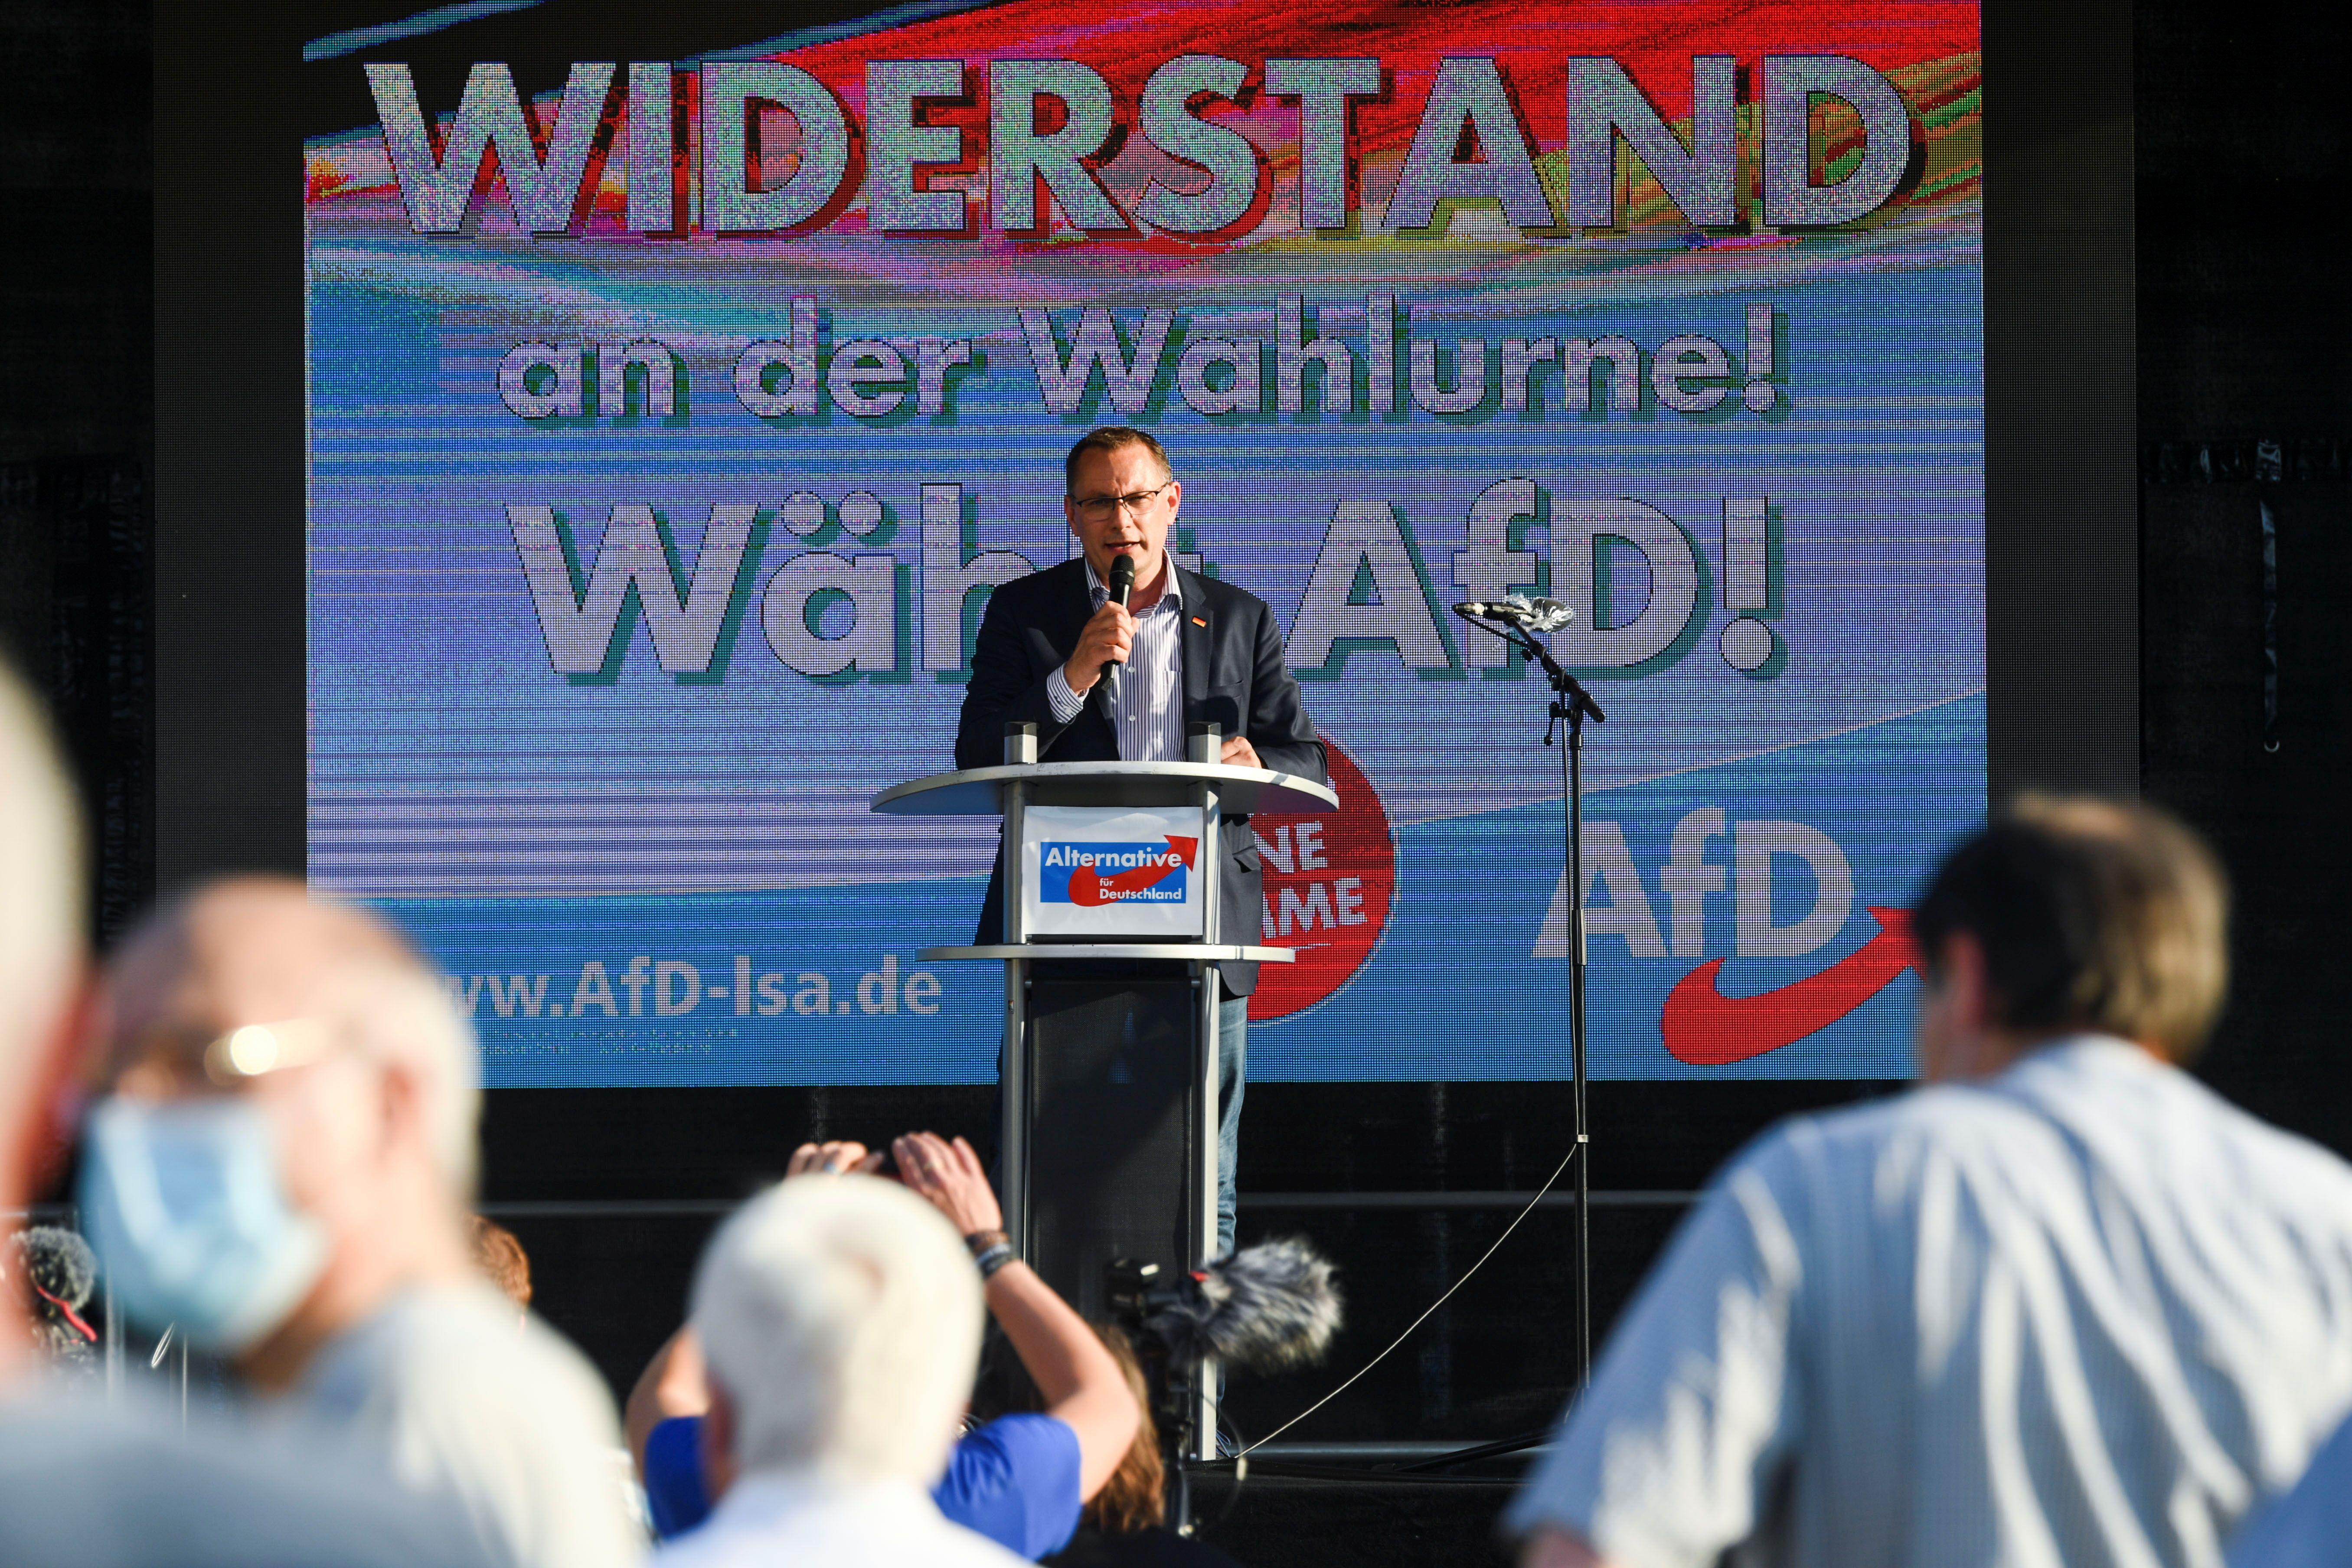 Un meeting de l'Afd, à Magdeburg, le 4 juin